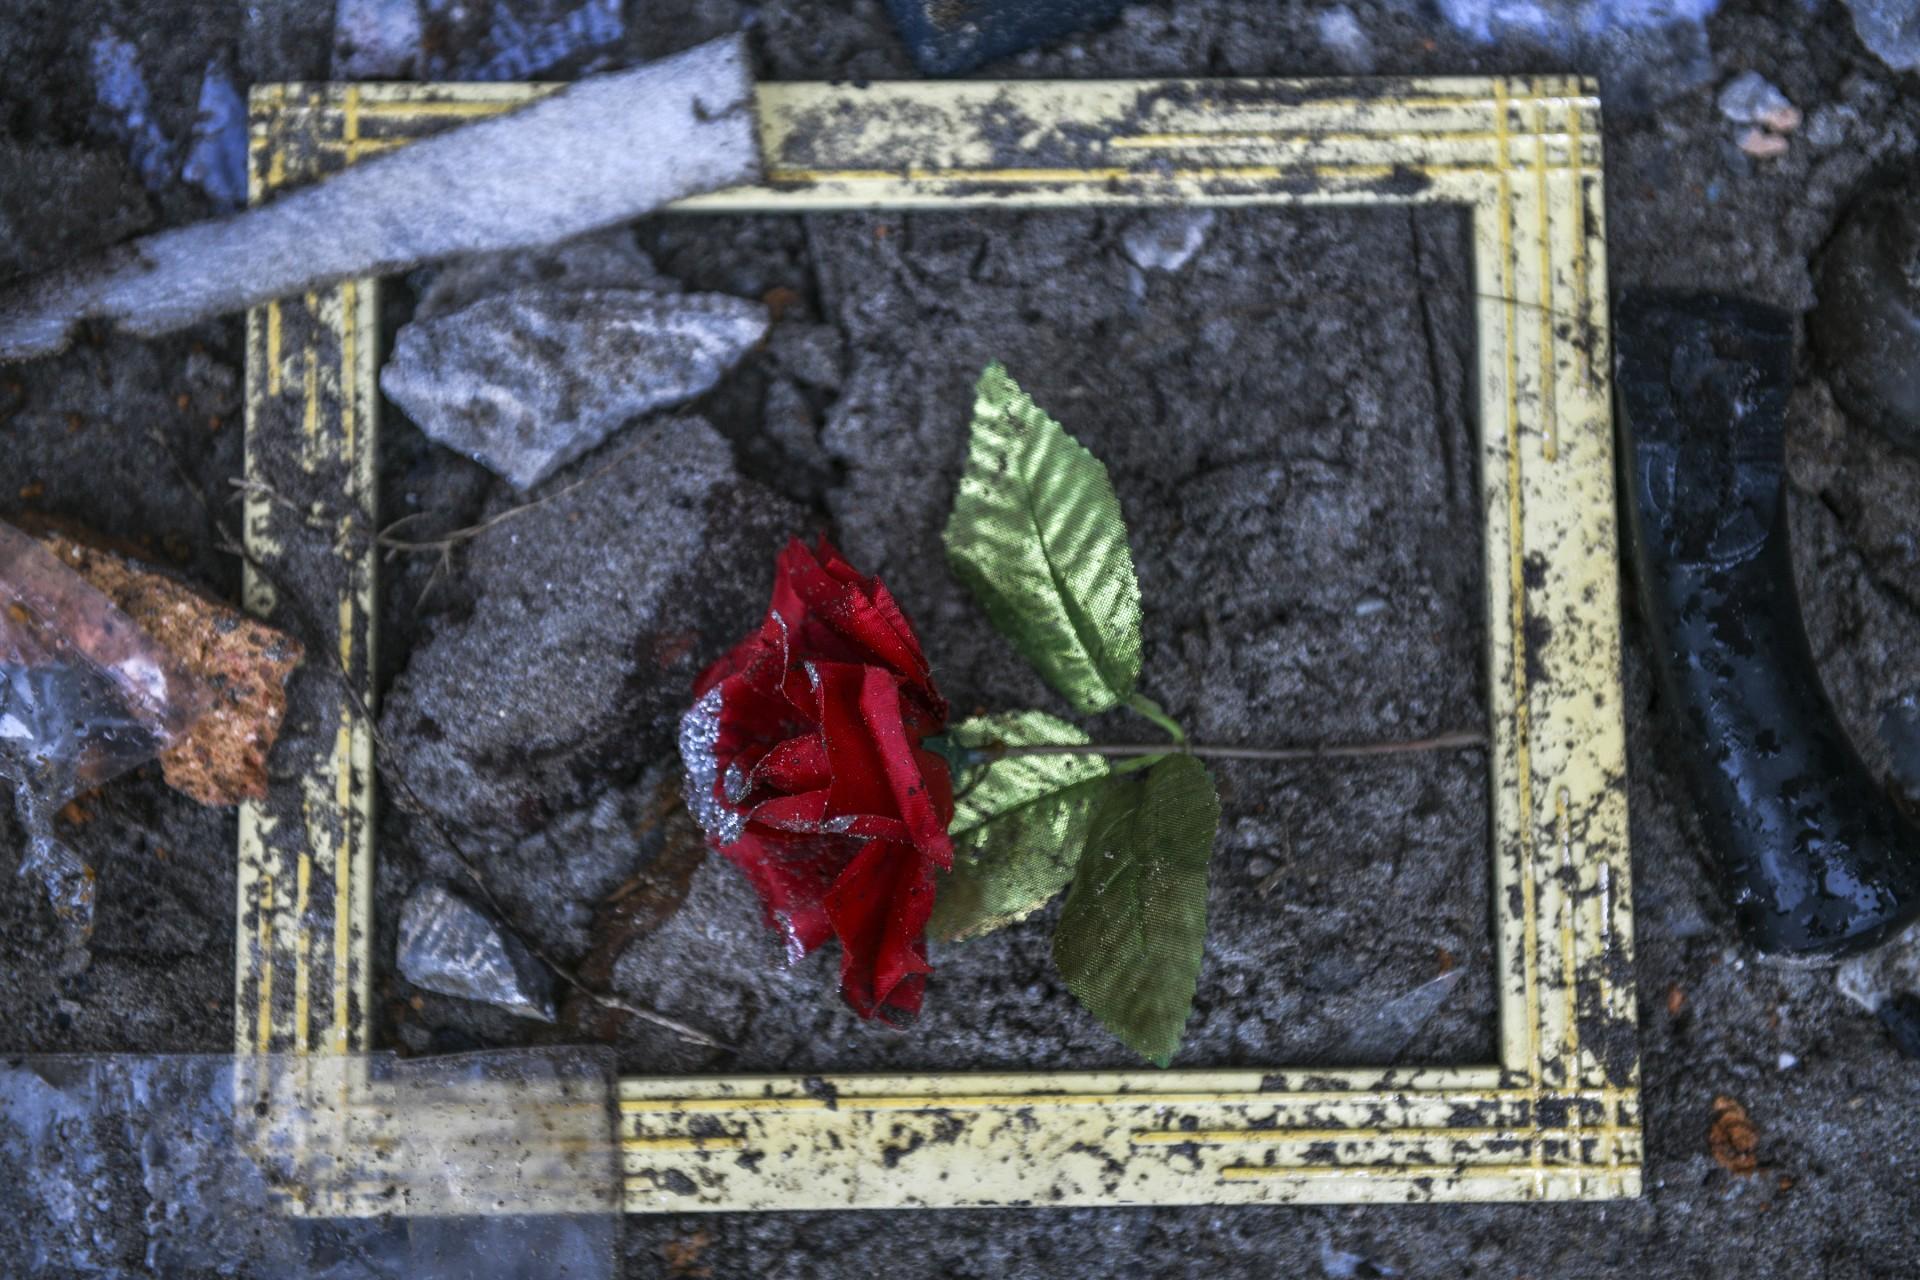 Una rosa artificial se ve en el piso afuera de una casa derrumbada en Rajabasa, en la provincia de Lampung, el 25 de diciembre de 2018.